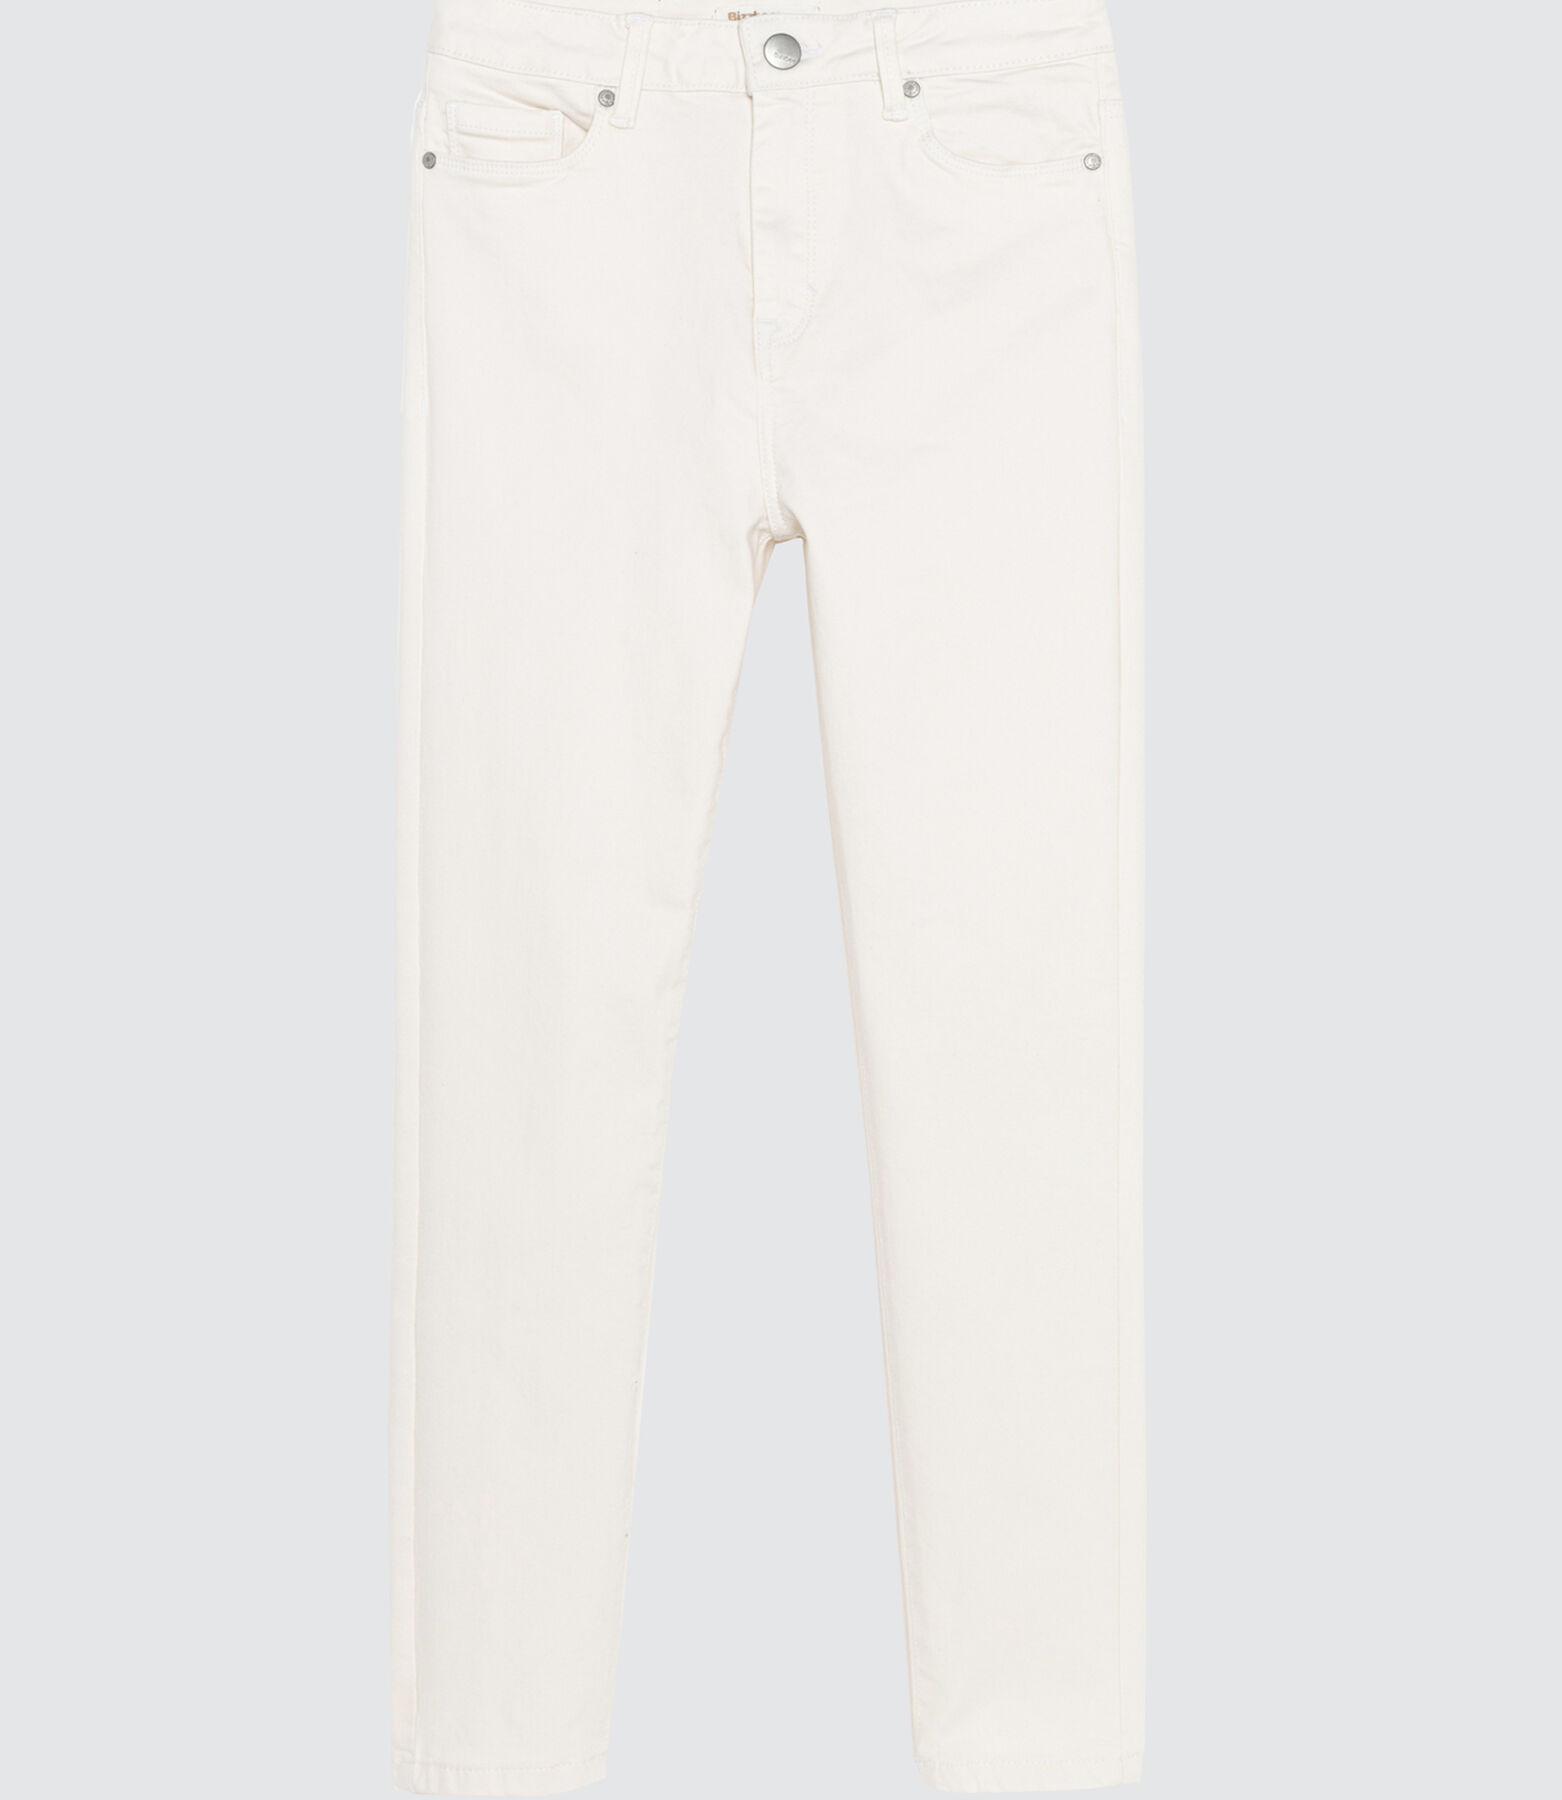 SKinny Blanc Taille Haute